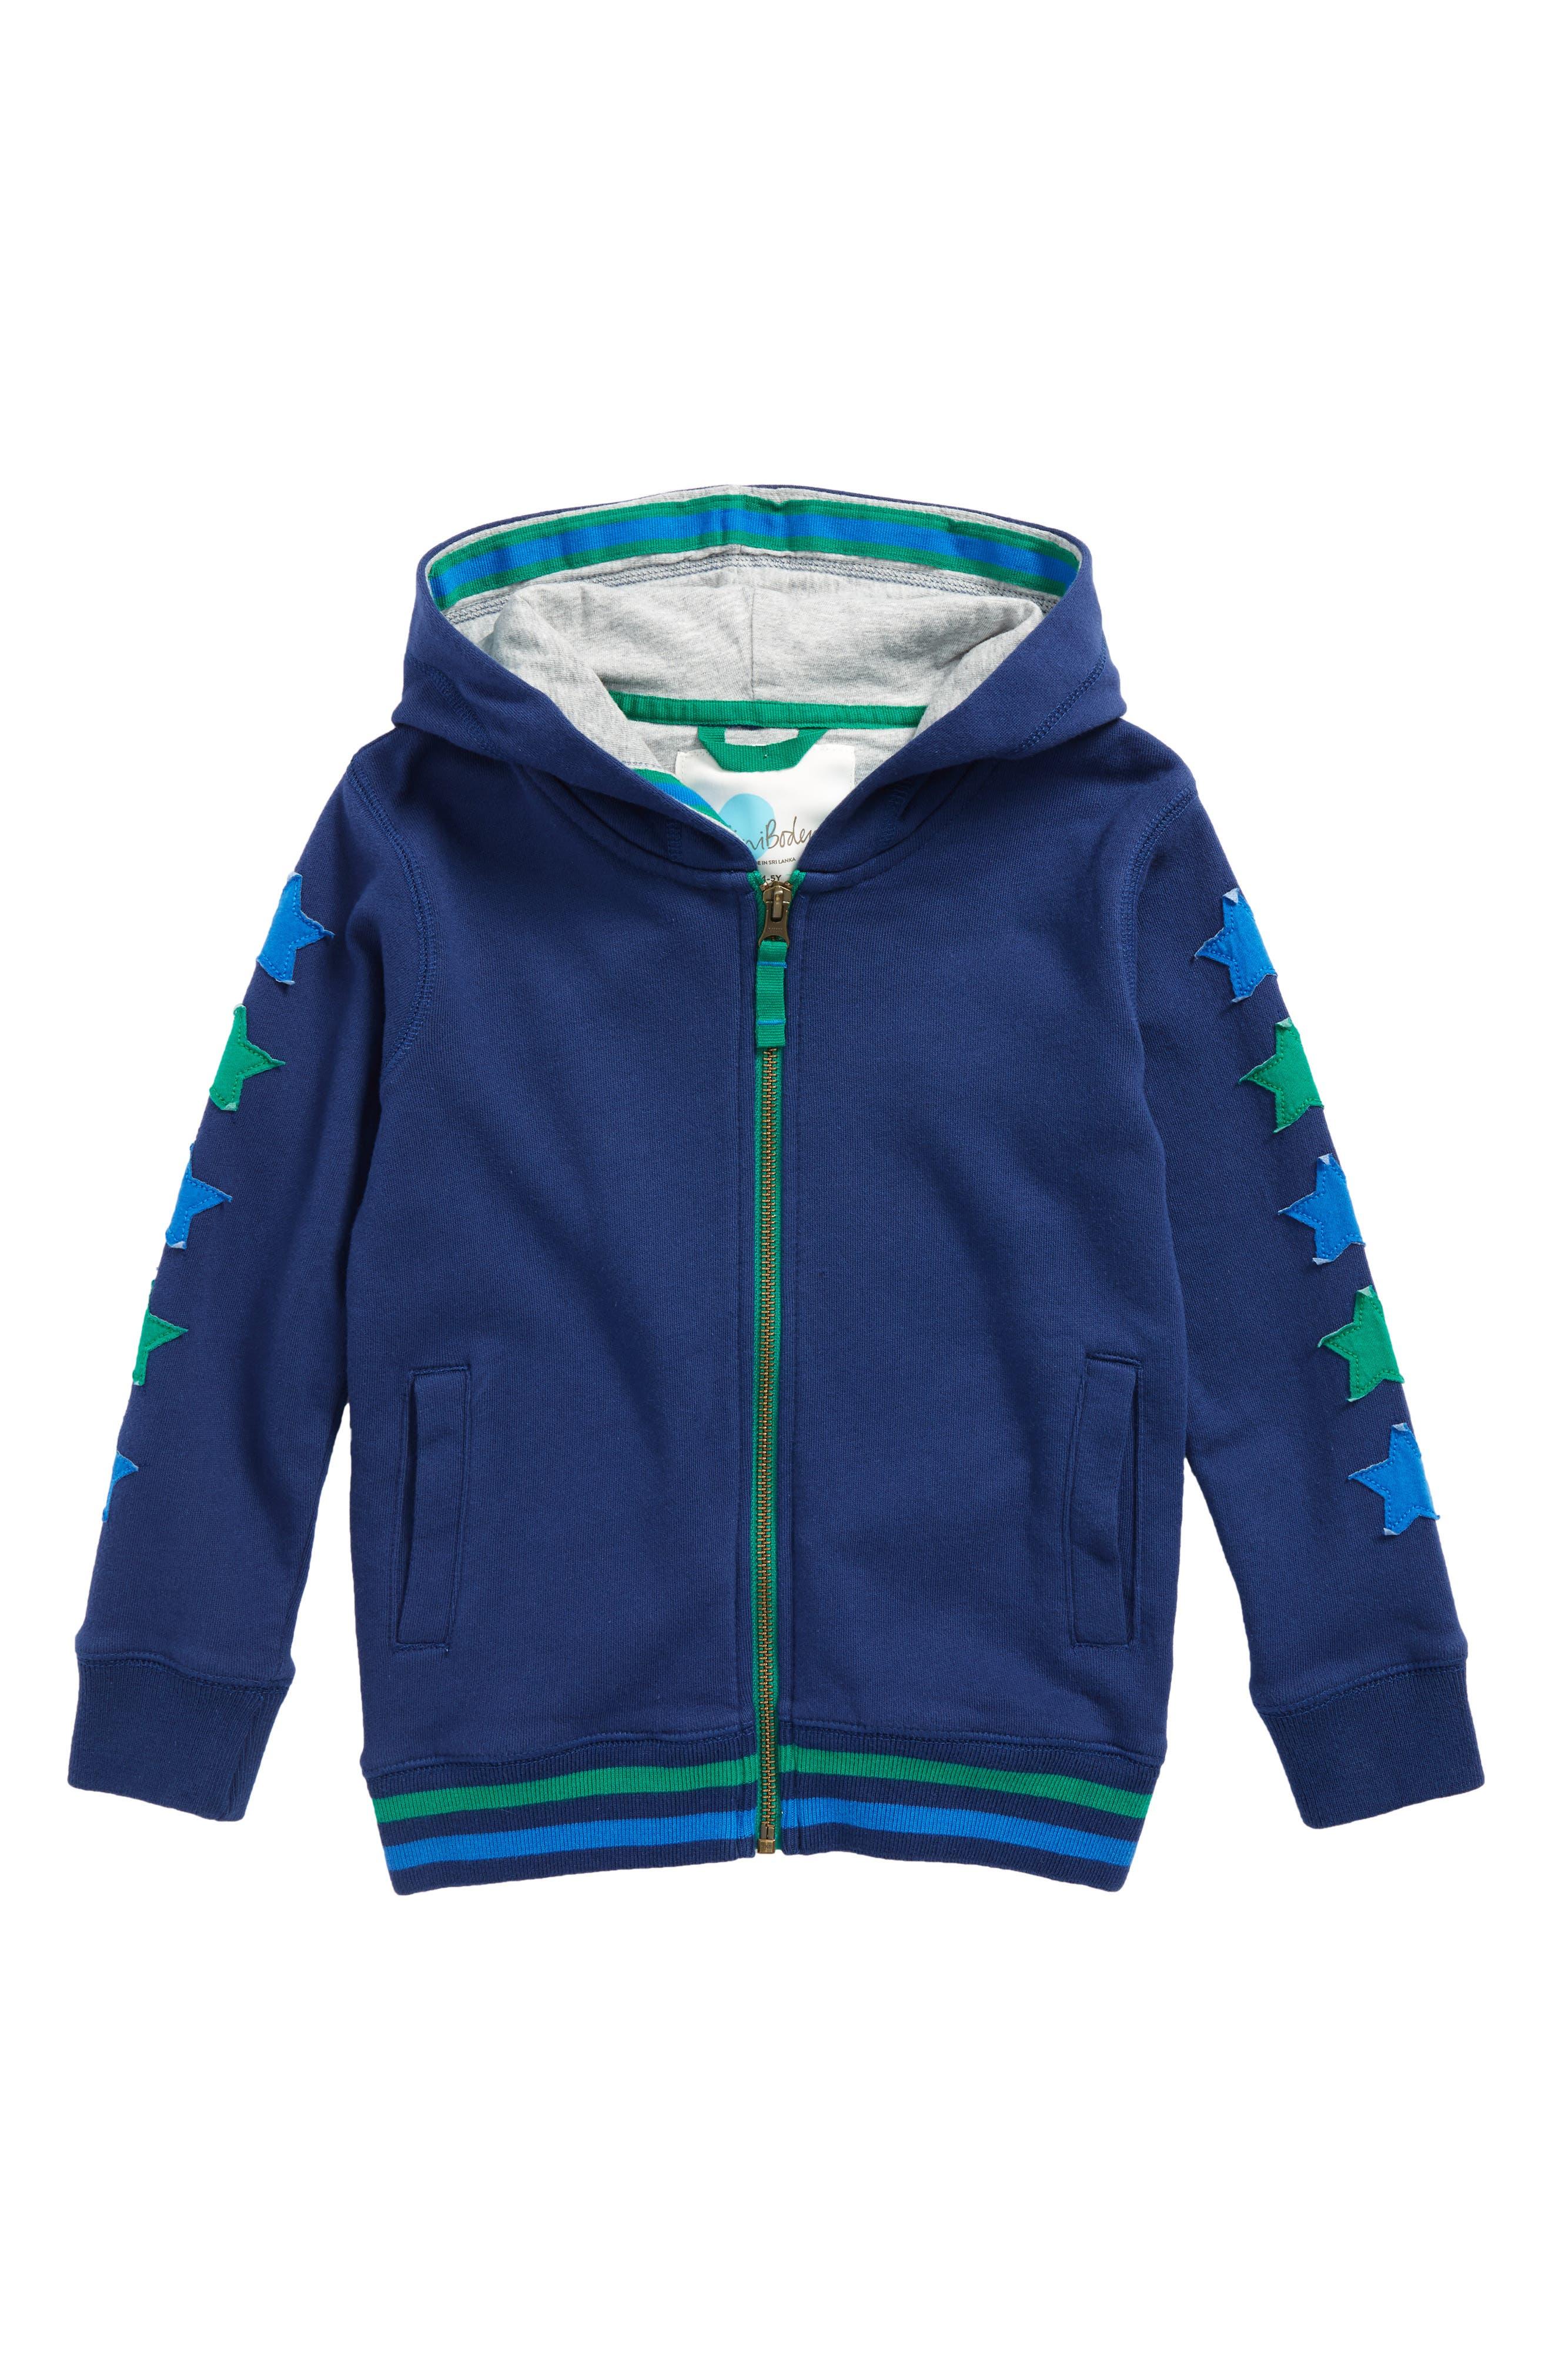 Mini Boden Starry Zip Hoodie (Toddler Boys, Little Boys & Big Boys)